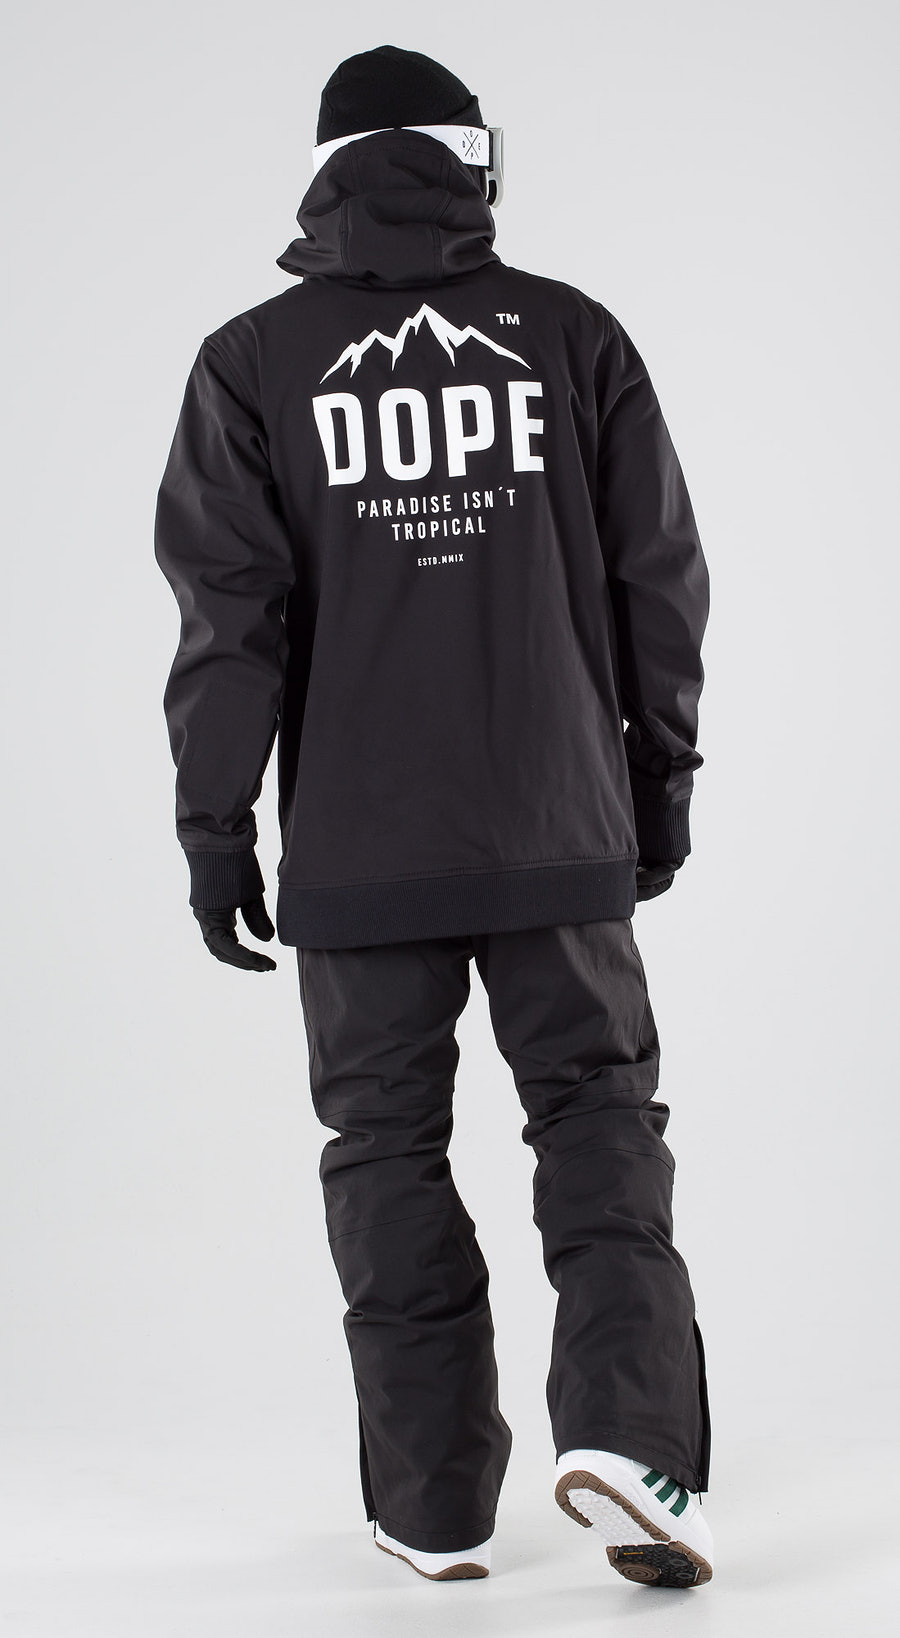 Dope Yeti Paradise II Black Snowboardkleidung Multi